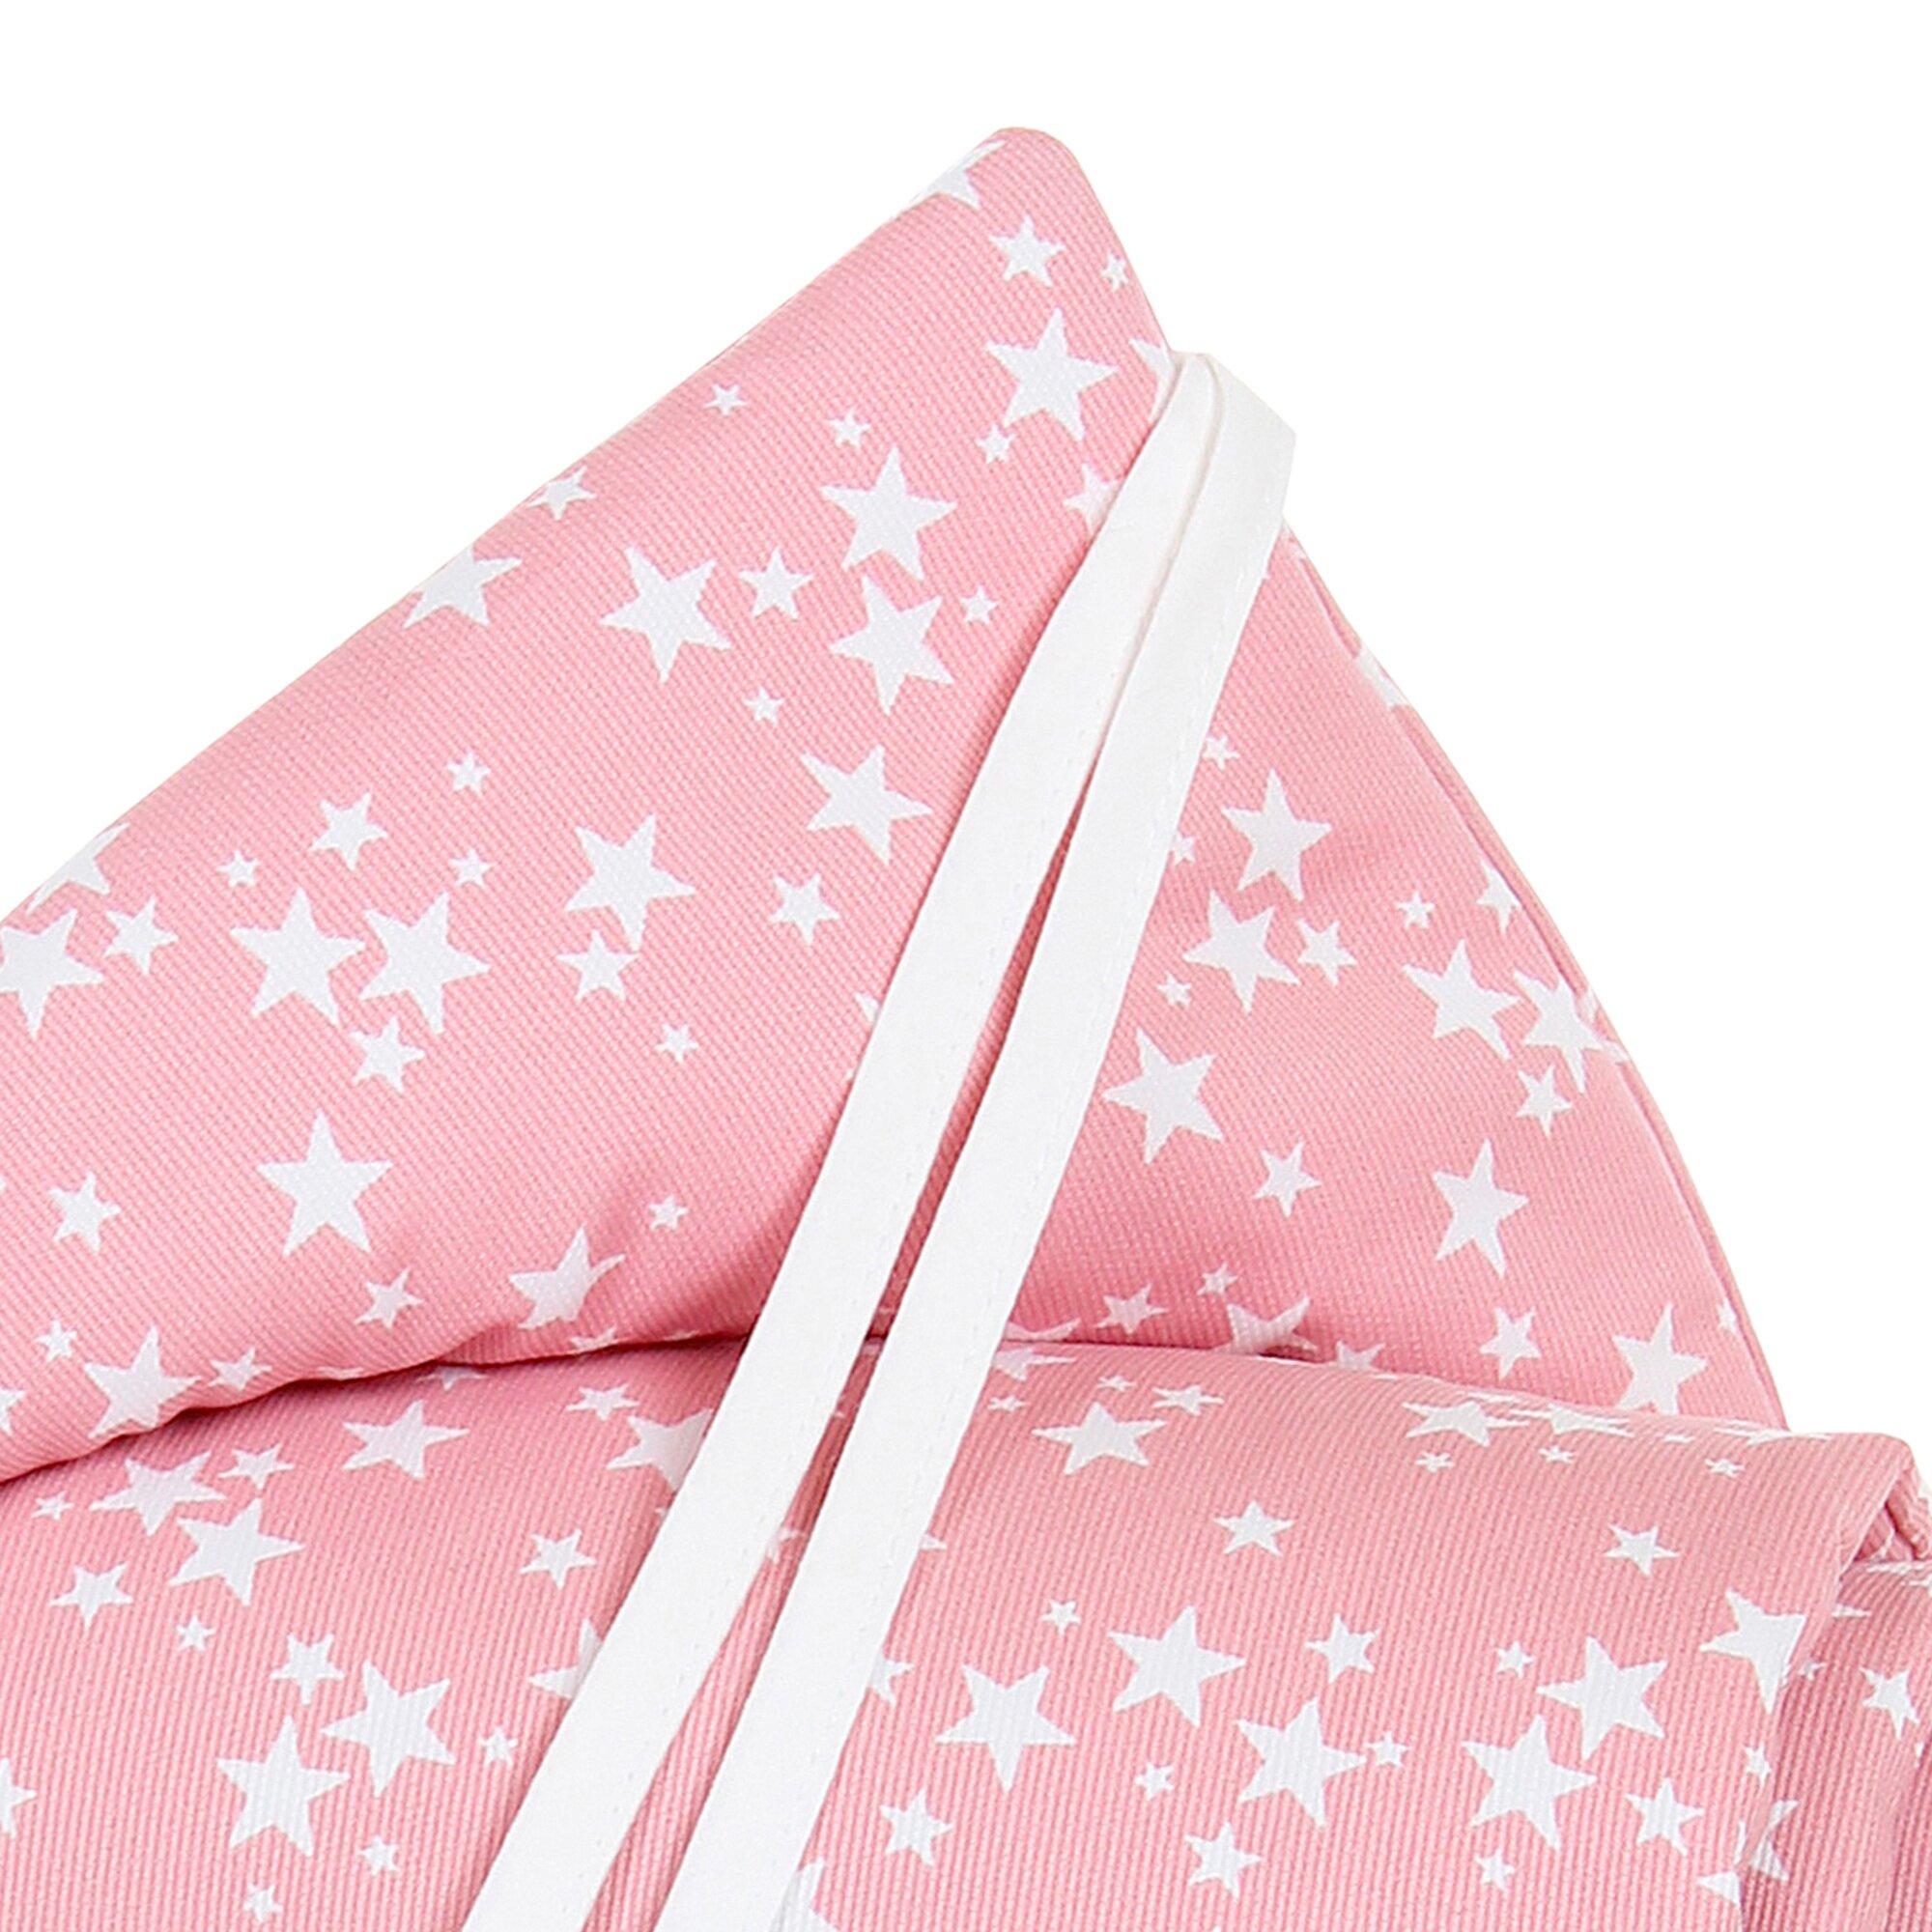 babybay-nestchen-pique-fur-maxi-boxspring-und-comfort-rosa